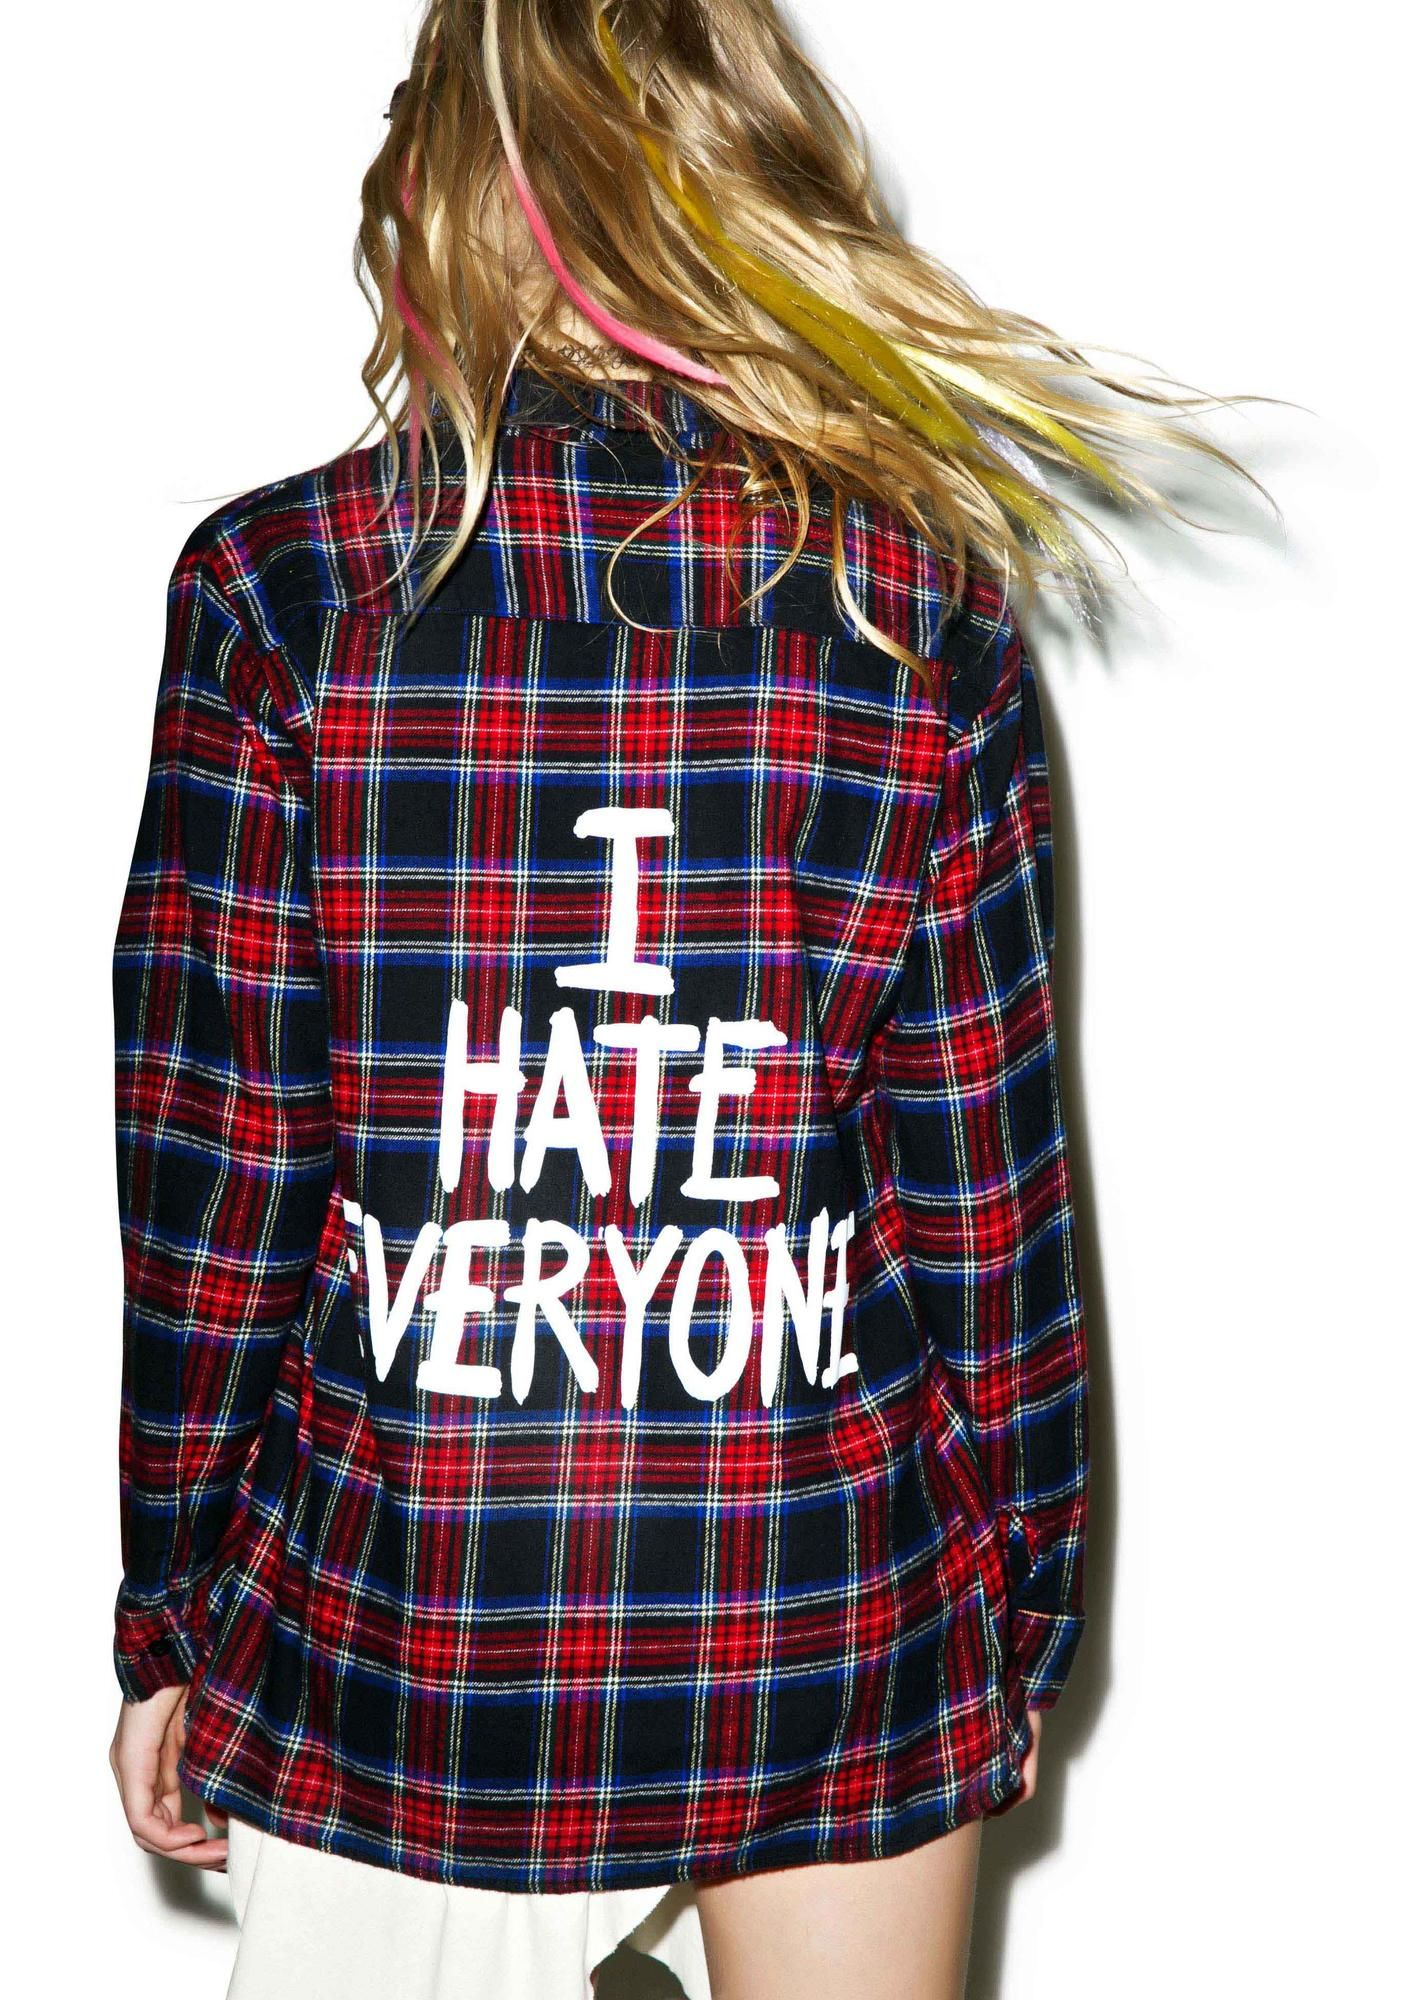 Flannel under shirt  Jac Vanek I Hate Everyone Flannel Shirt when ya legit literally can